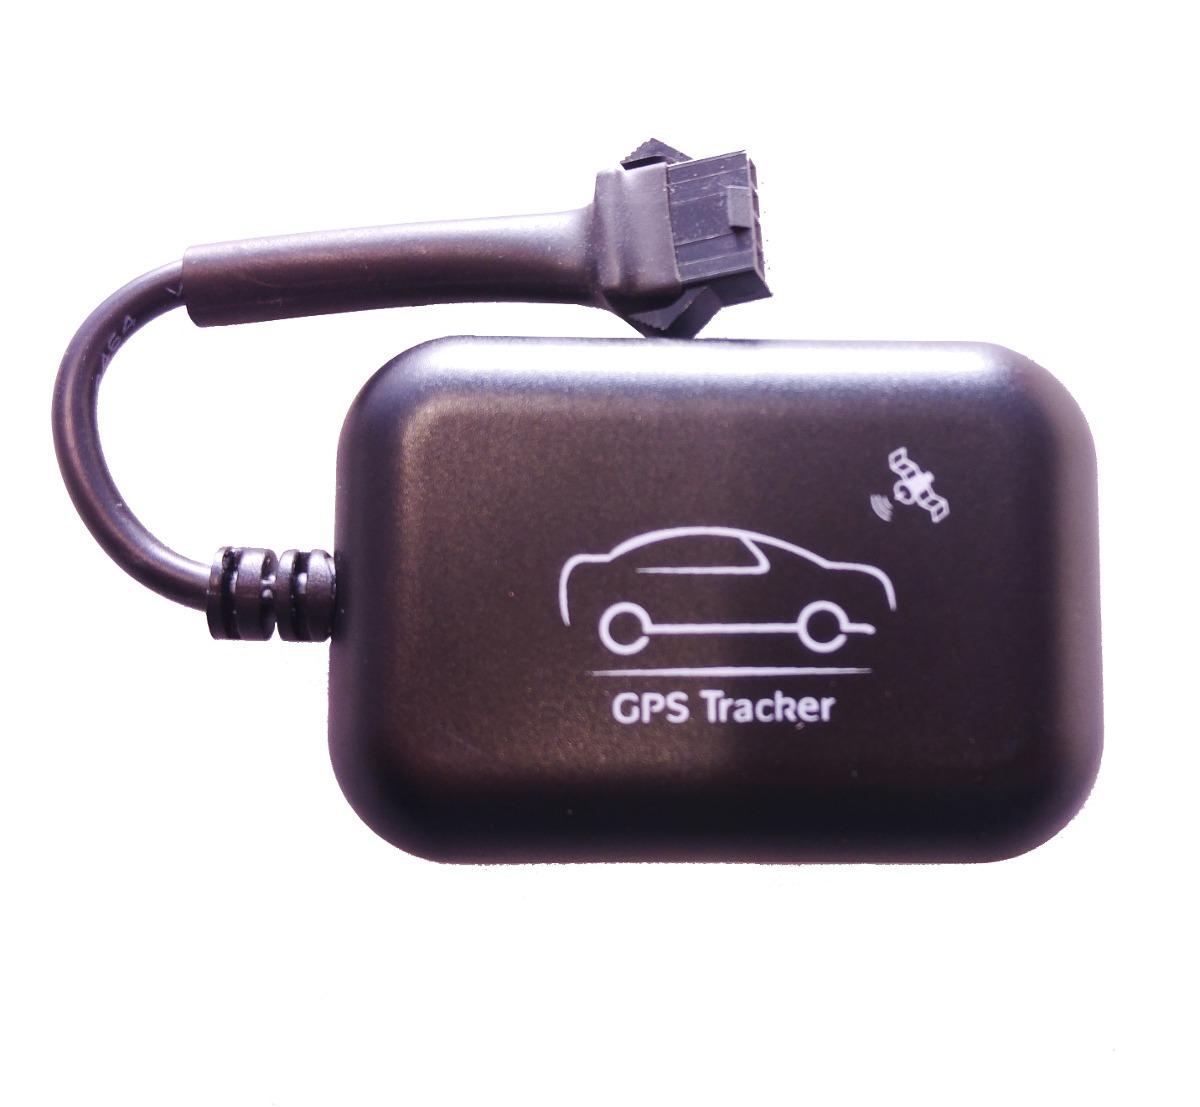 Localizador satelital para autos lo jack - rastreo satelital de autos